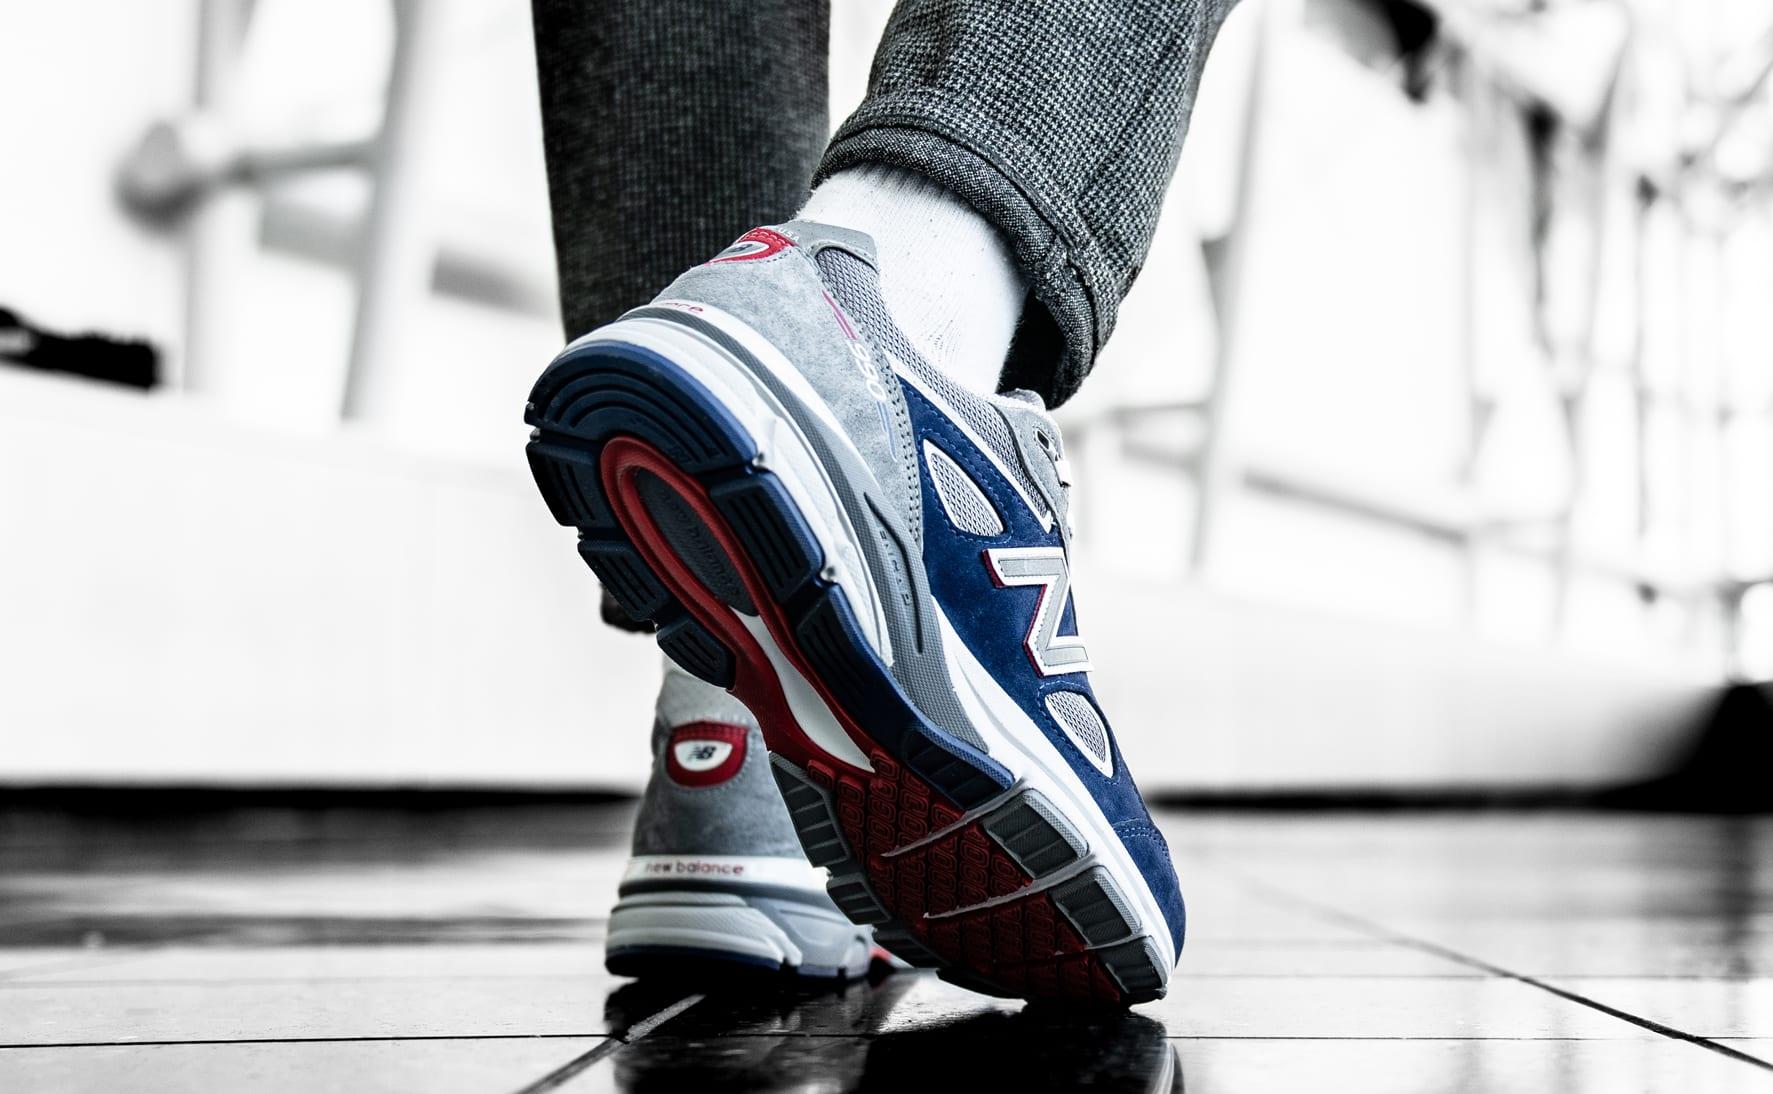 DTLR/Villa x New Balance 990 (On-Foot Heel)